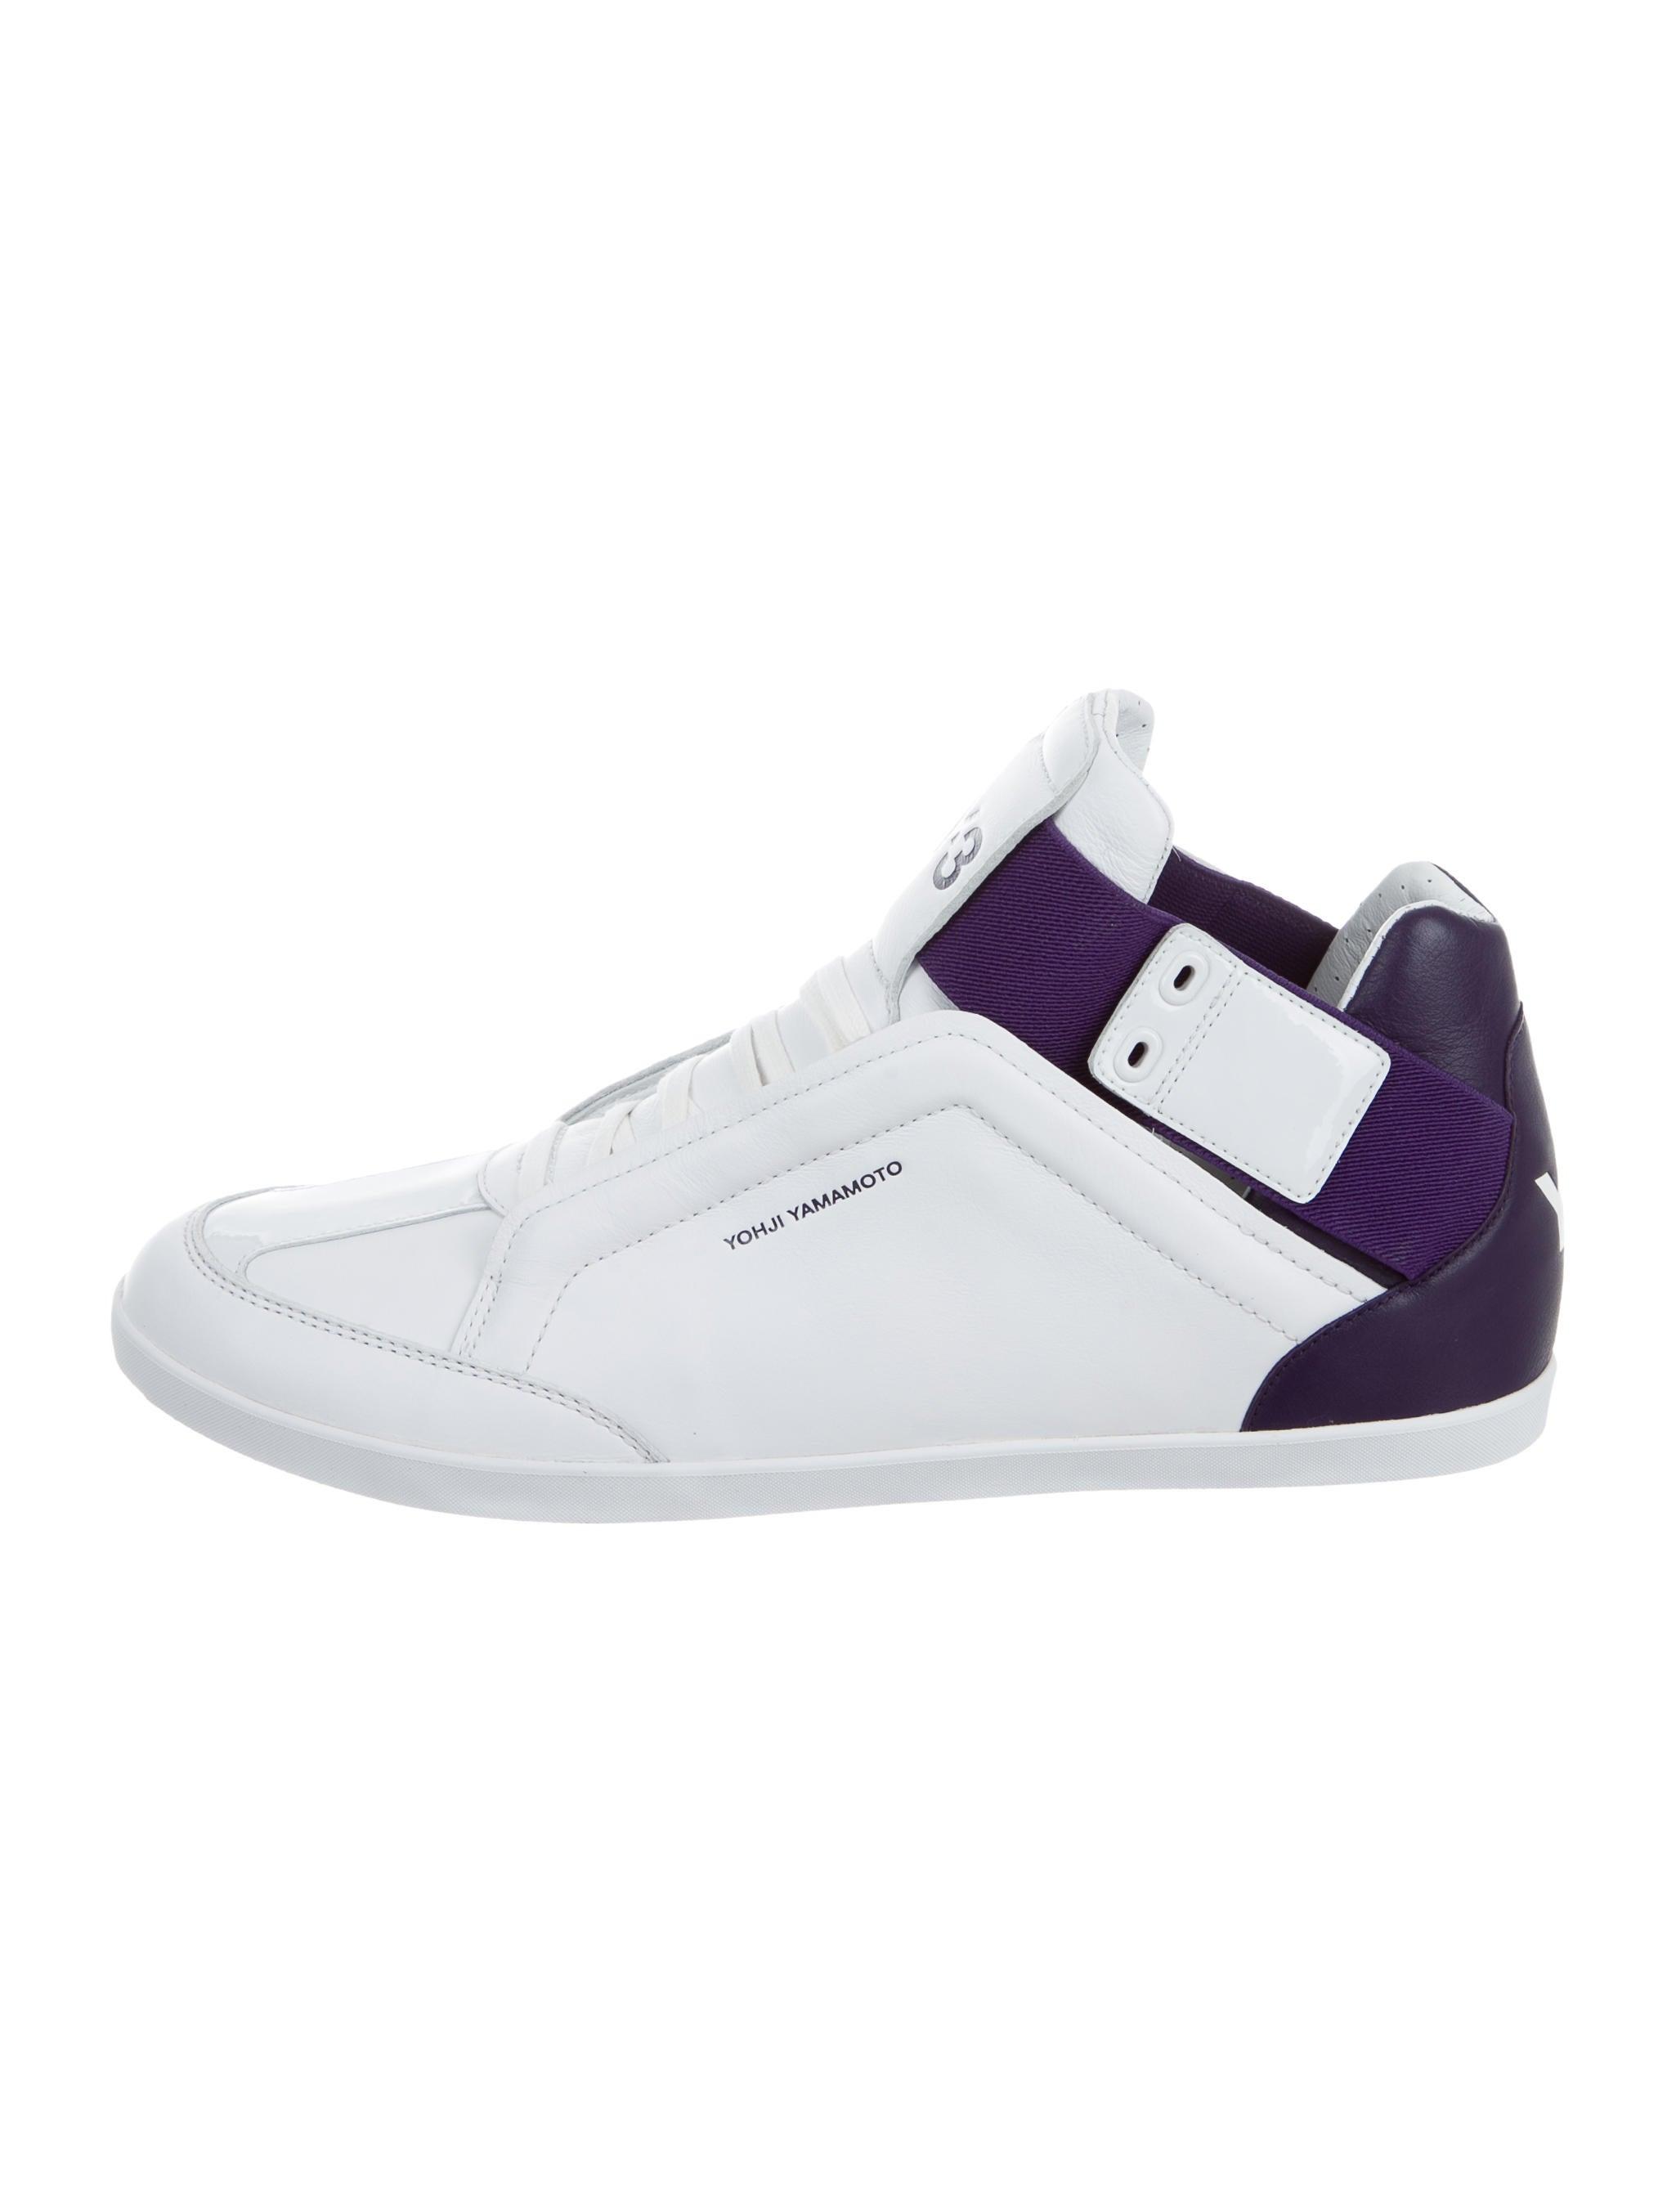 dc1c23b64a36e Y-3 x Adidas Kazuhiri Leather Sneakers - Shoes - WY3AD20551